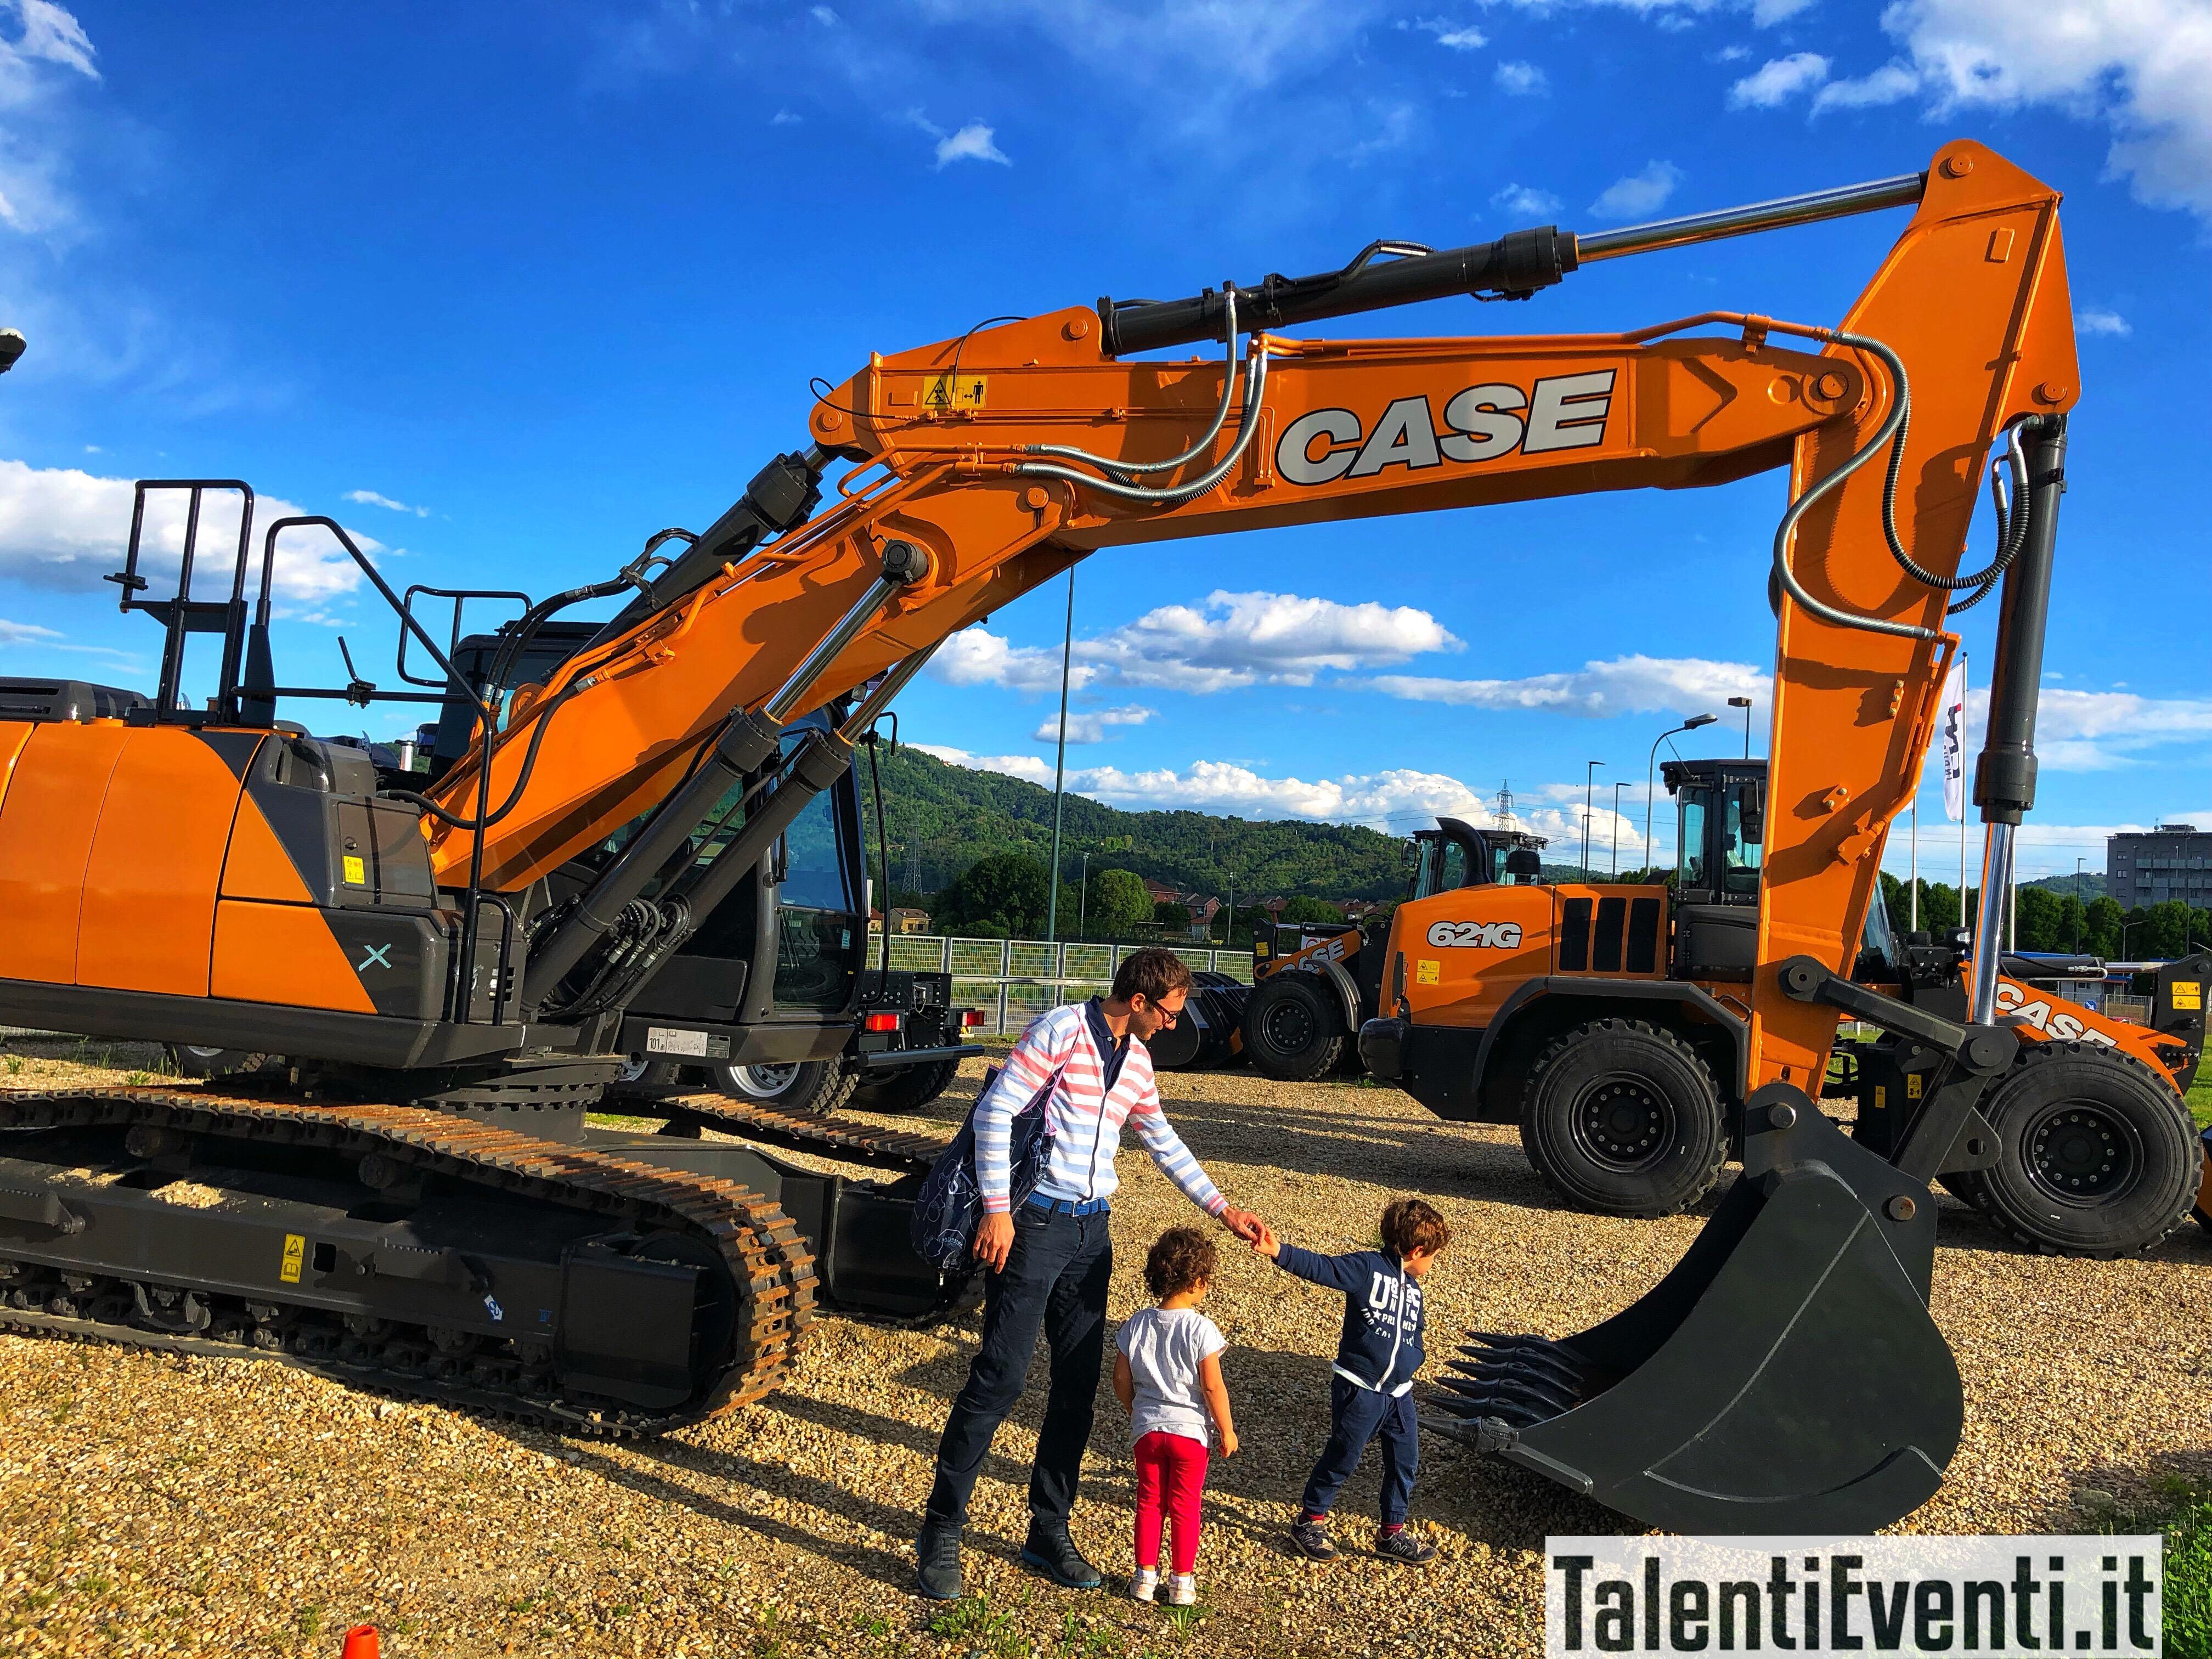 talenti_eventi_cnh_industrial_village_2